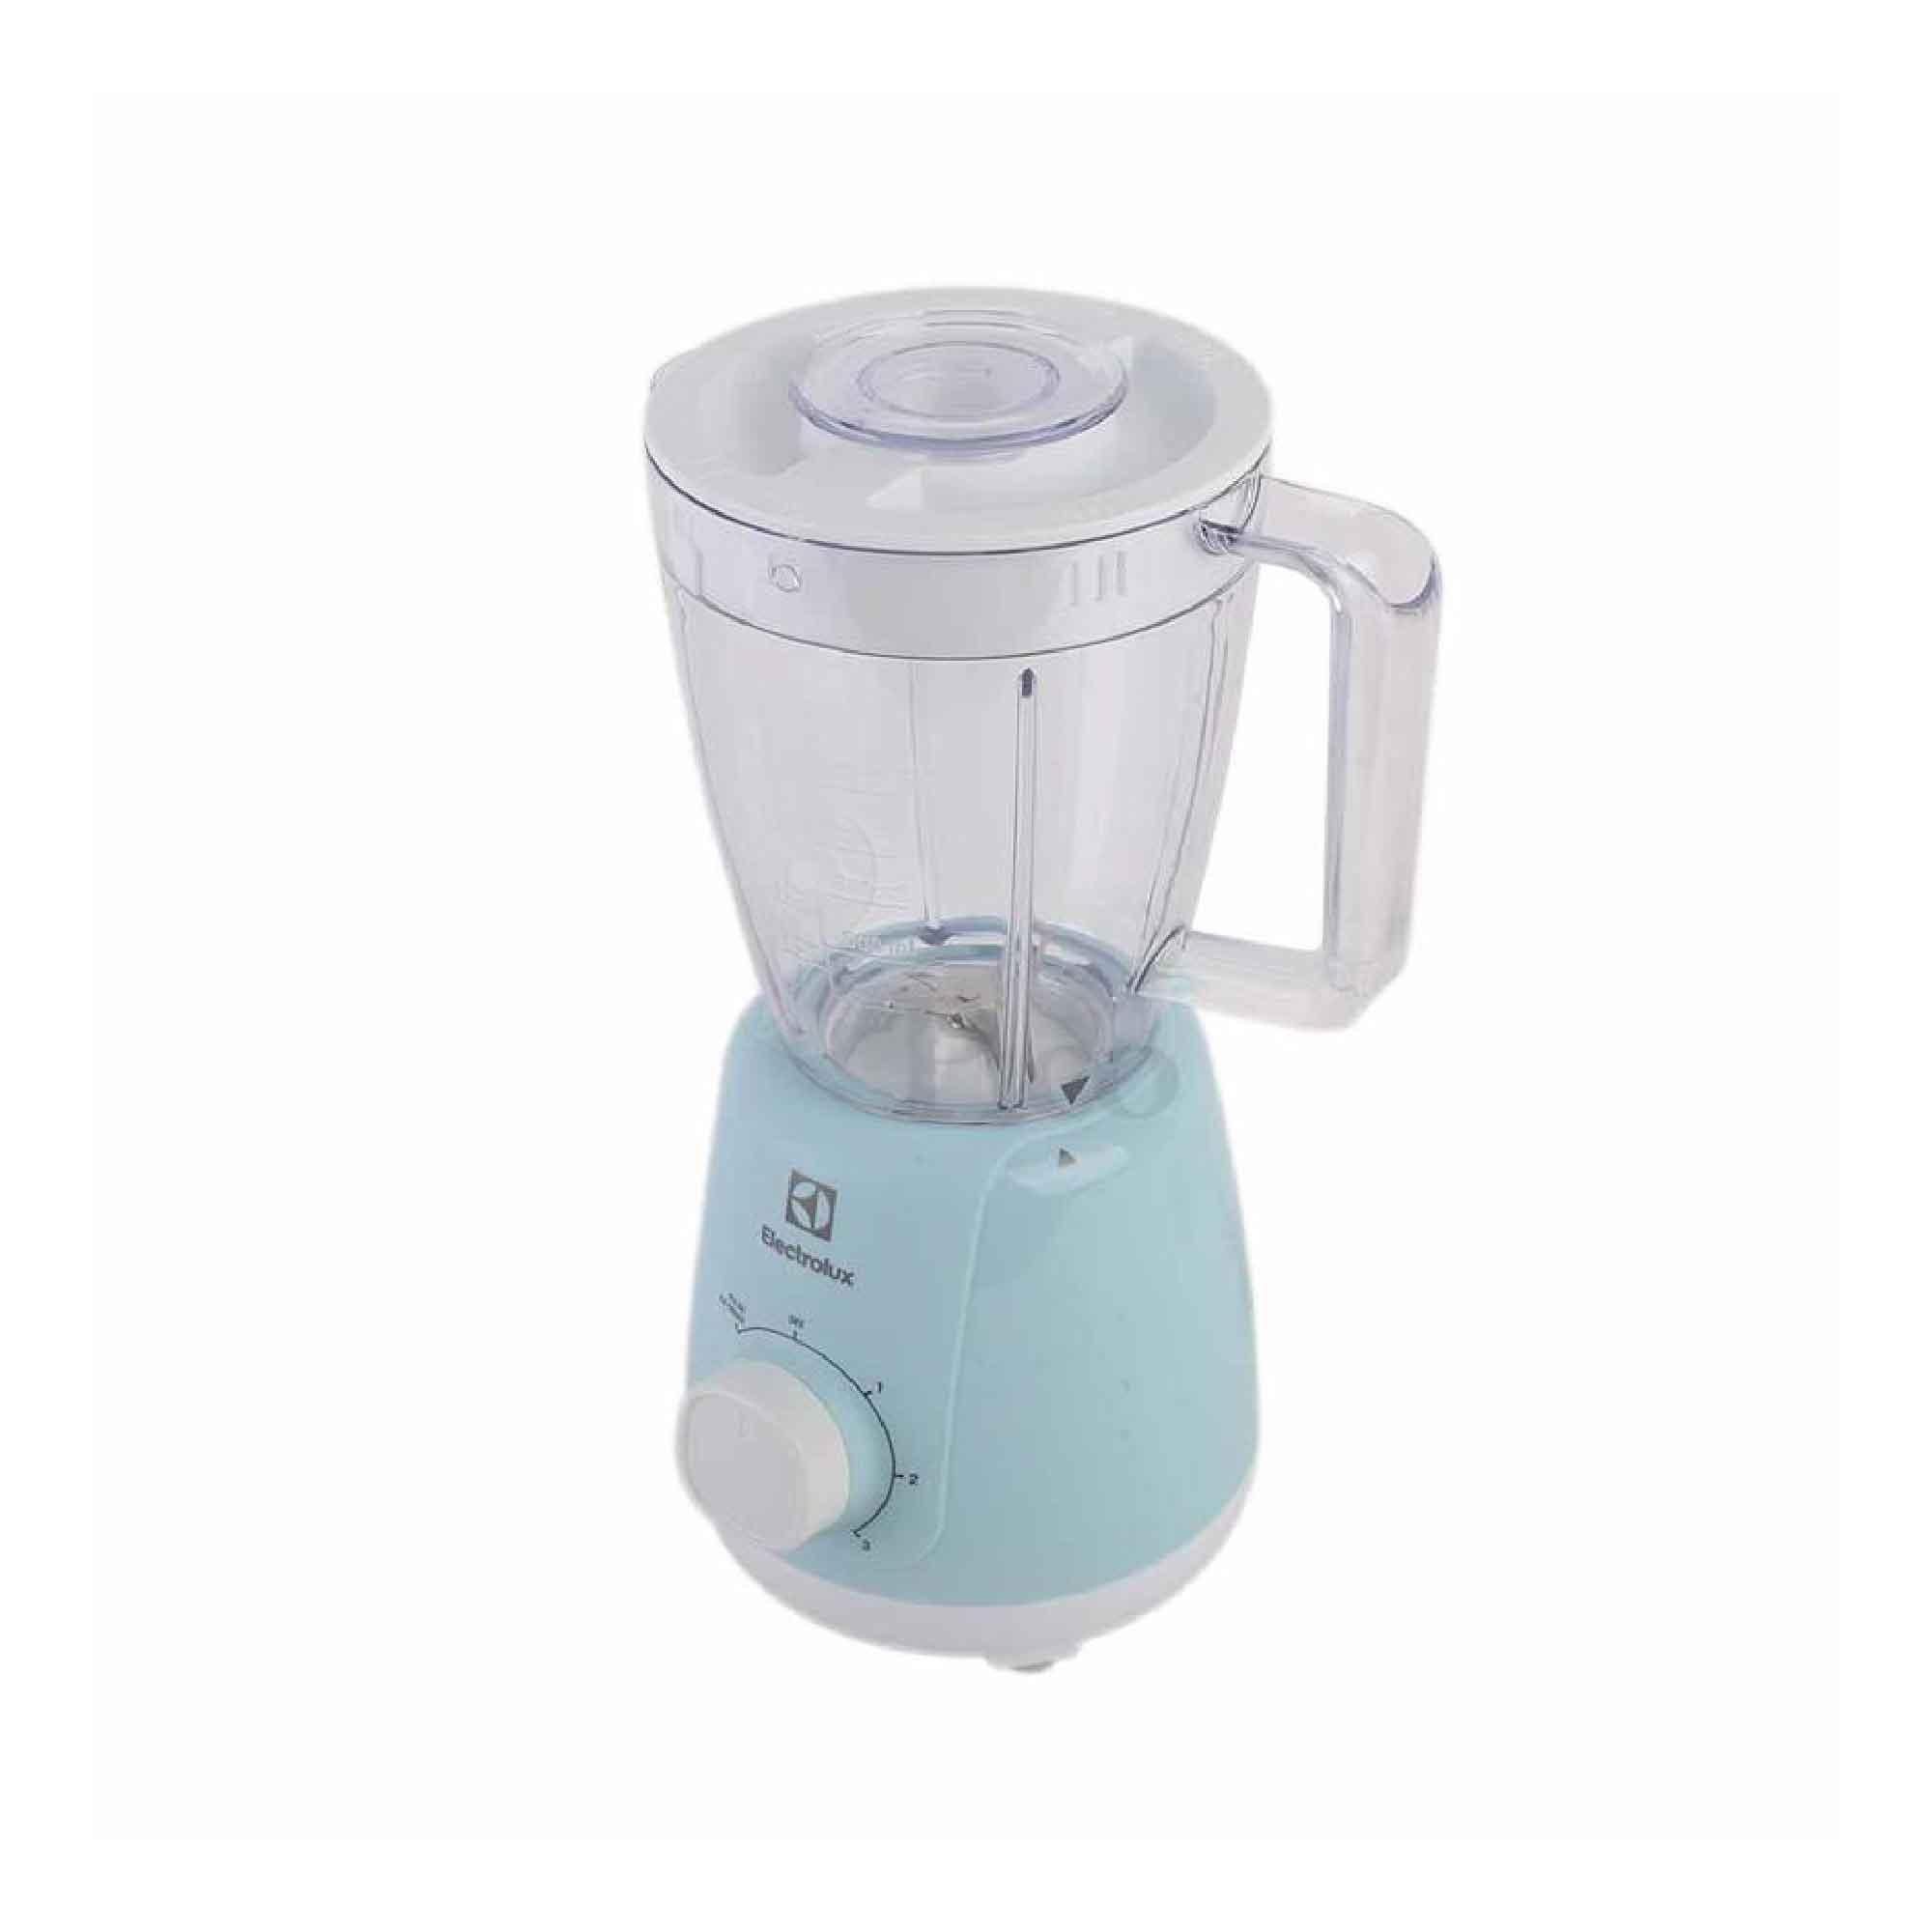 electrolux blender ebr3416 400w 1 5 end 5 2 2020 4 36 pm rh lelong com my Blender Tutorials Washing Machine User Manual